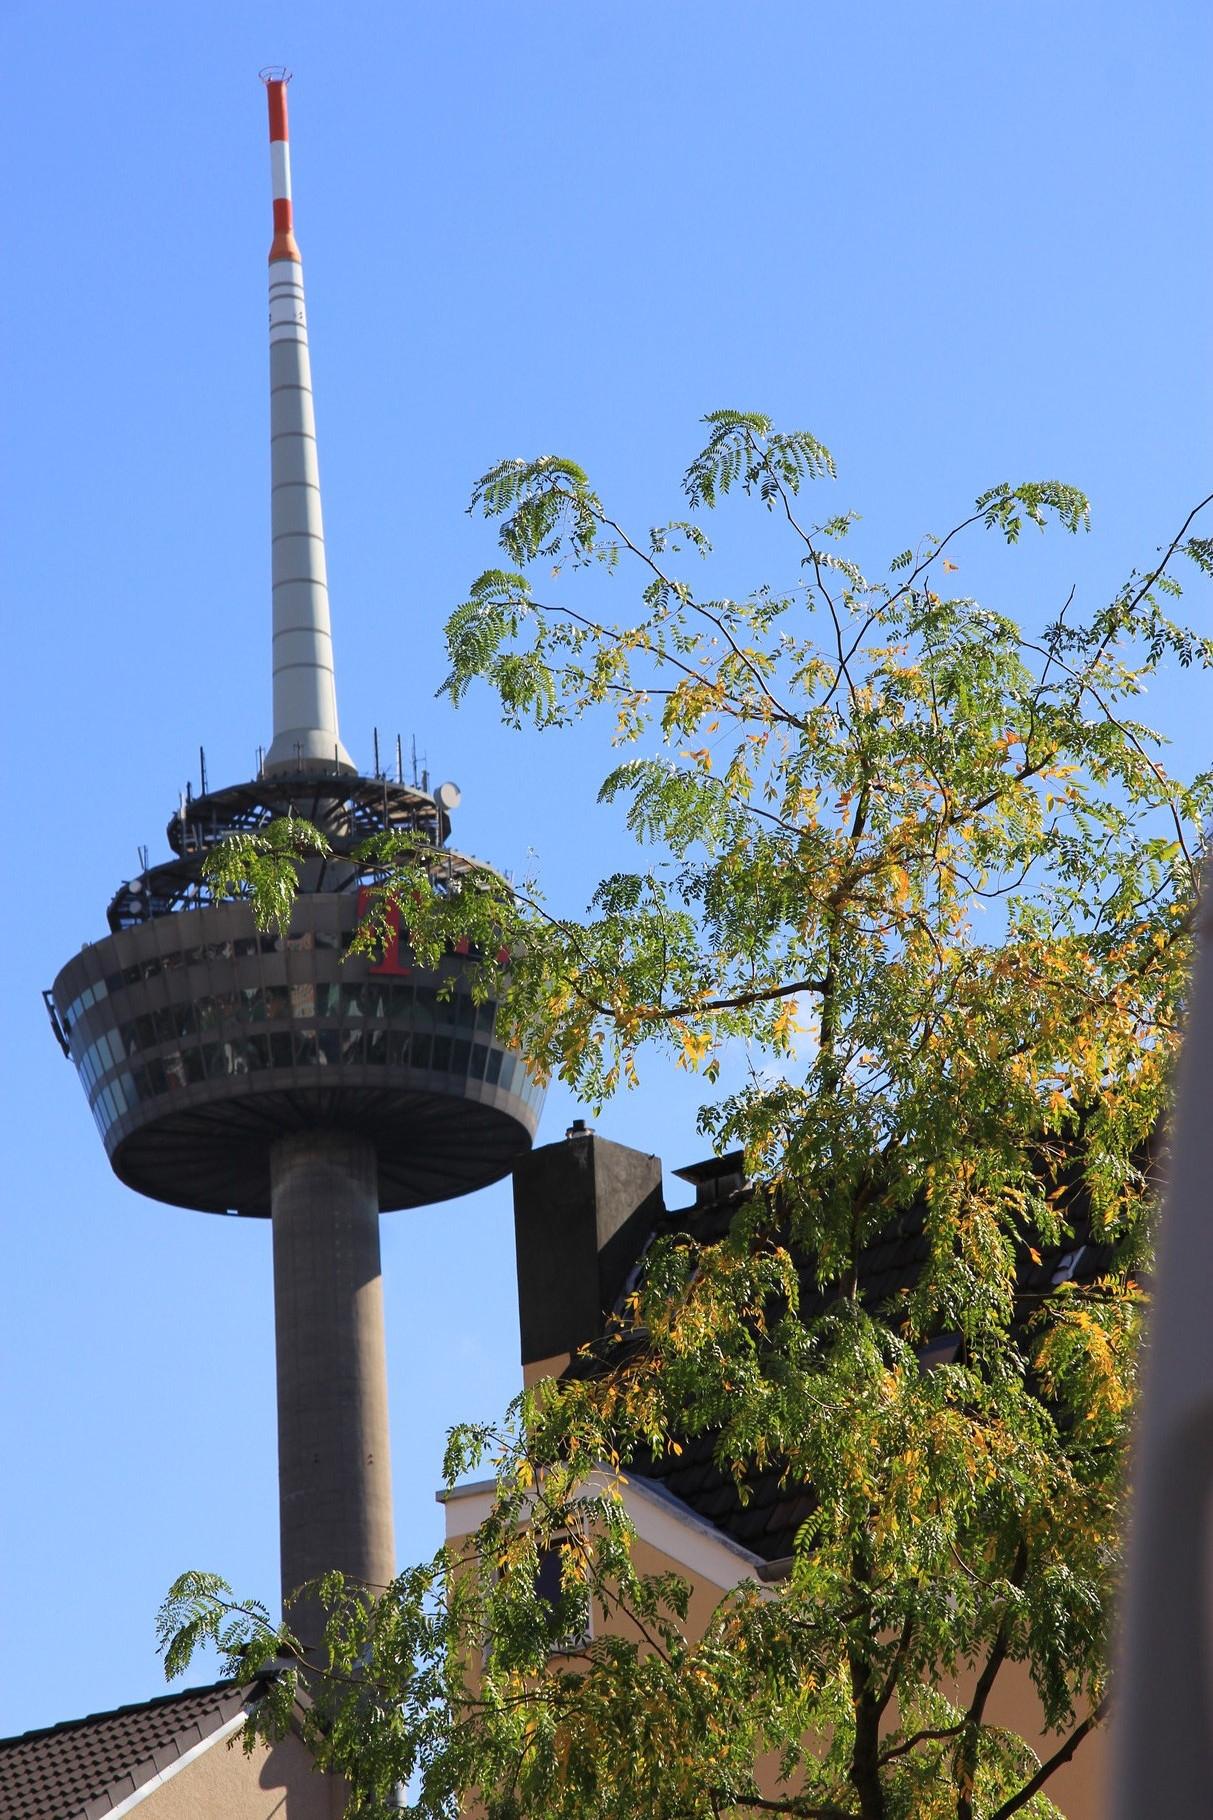 Ehrenfeld-Führung - Blick auf den Kölner Fernsehturm